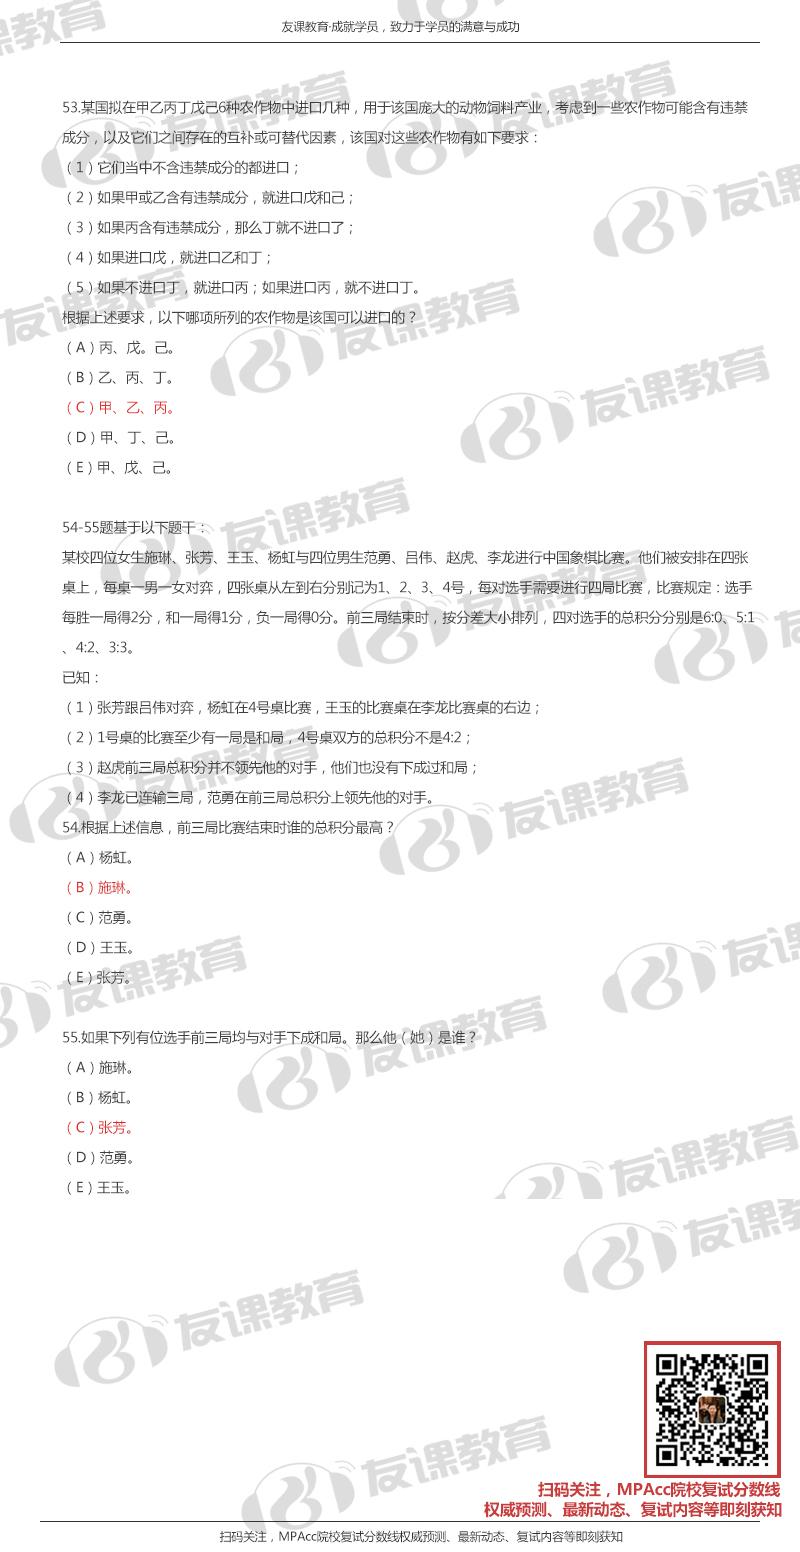 mpacc逻辑6-6.jpg